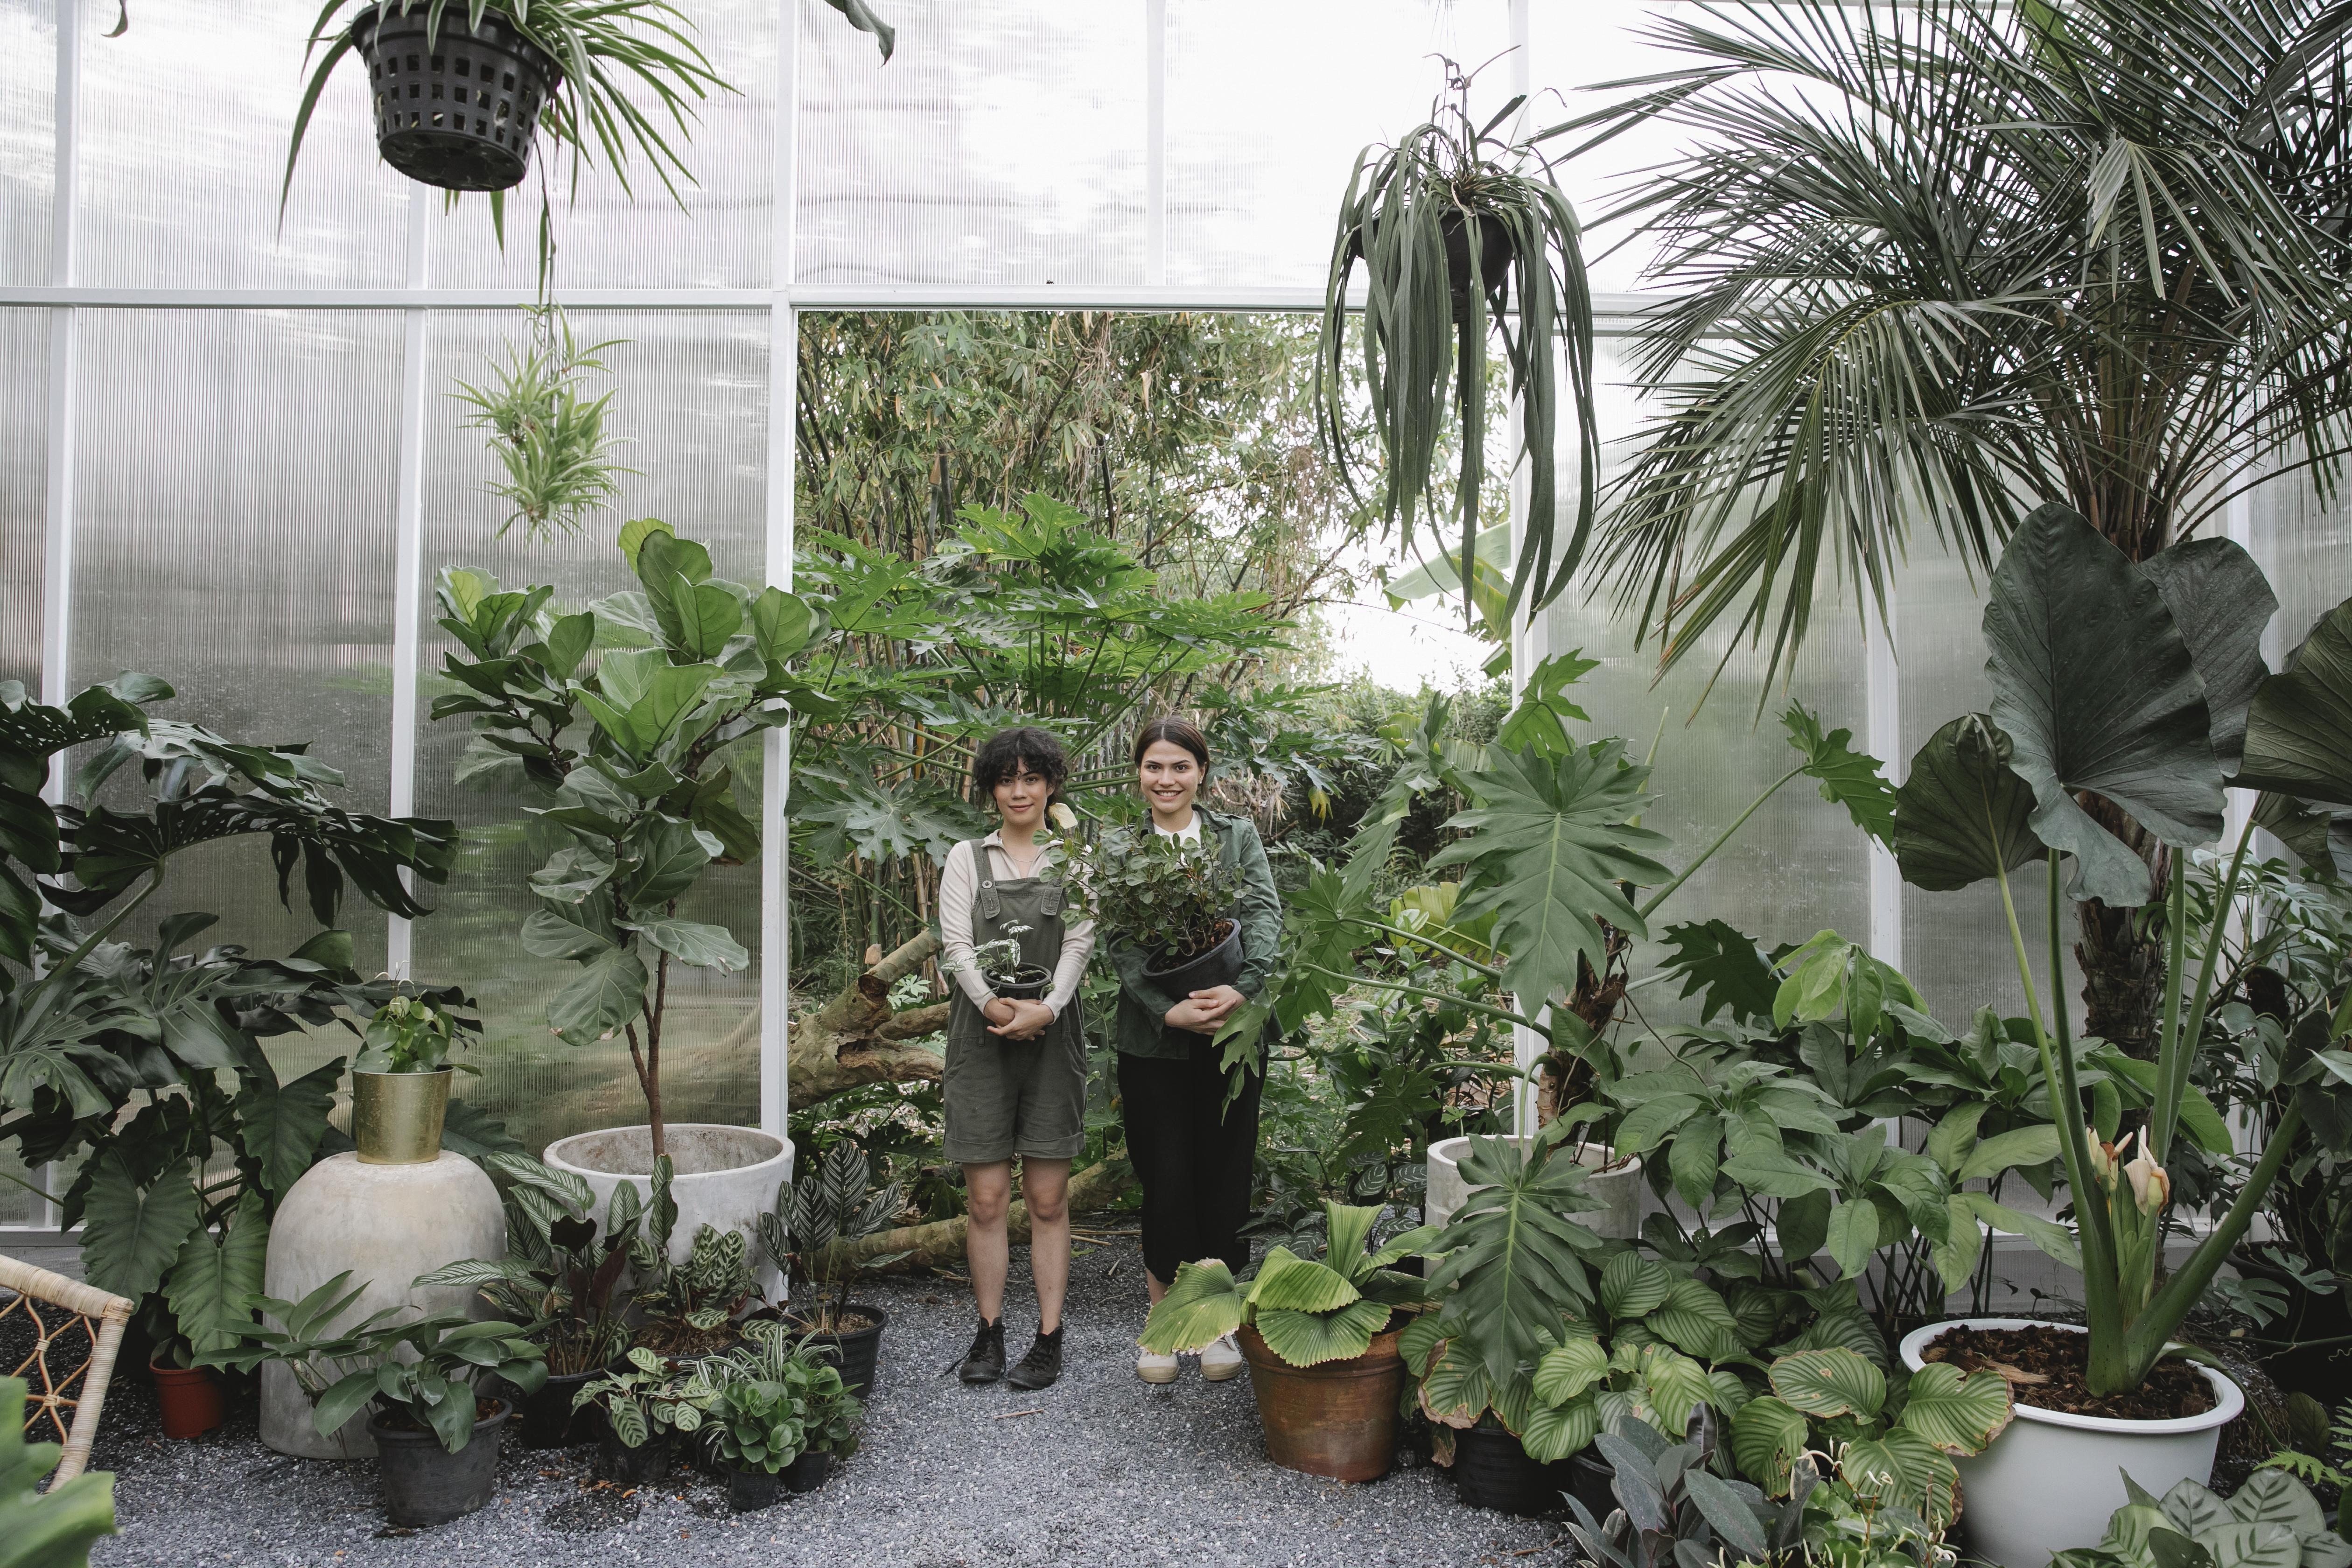 ethnic female gardeners with flowerpots